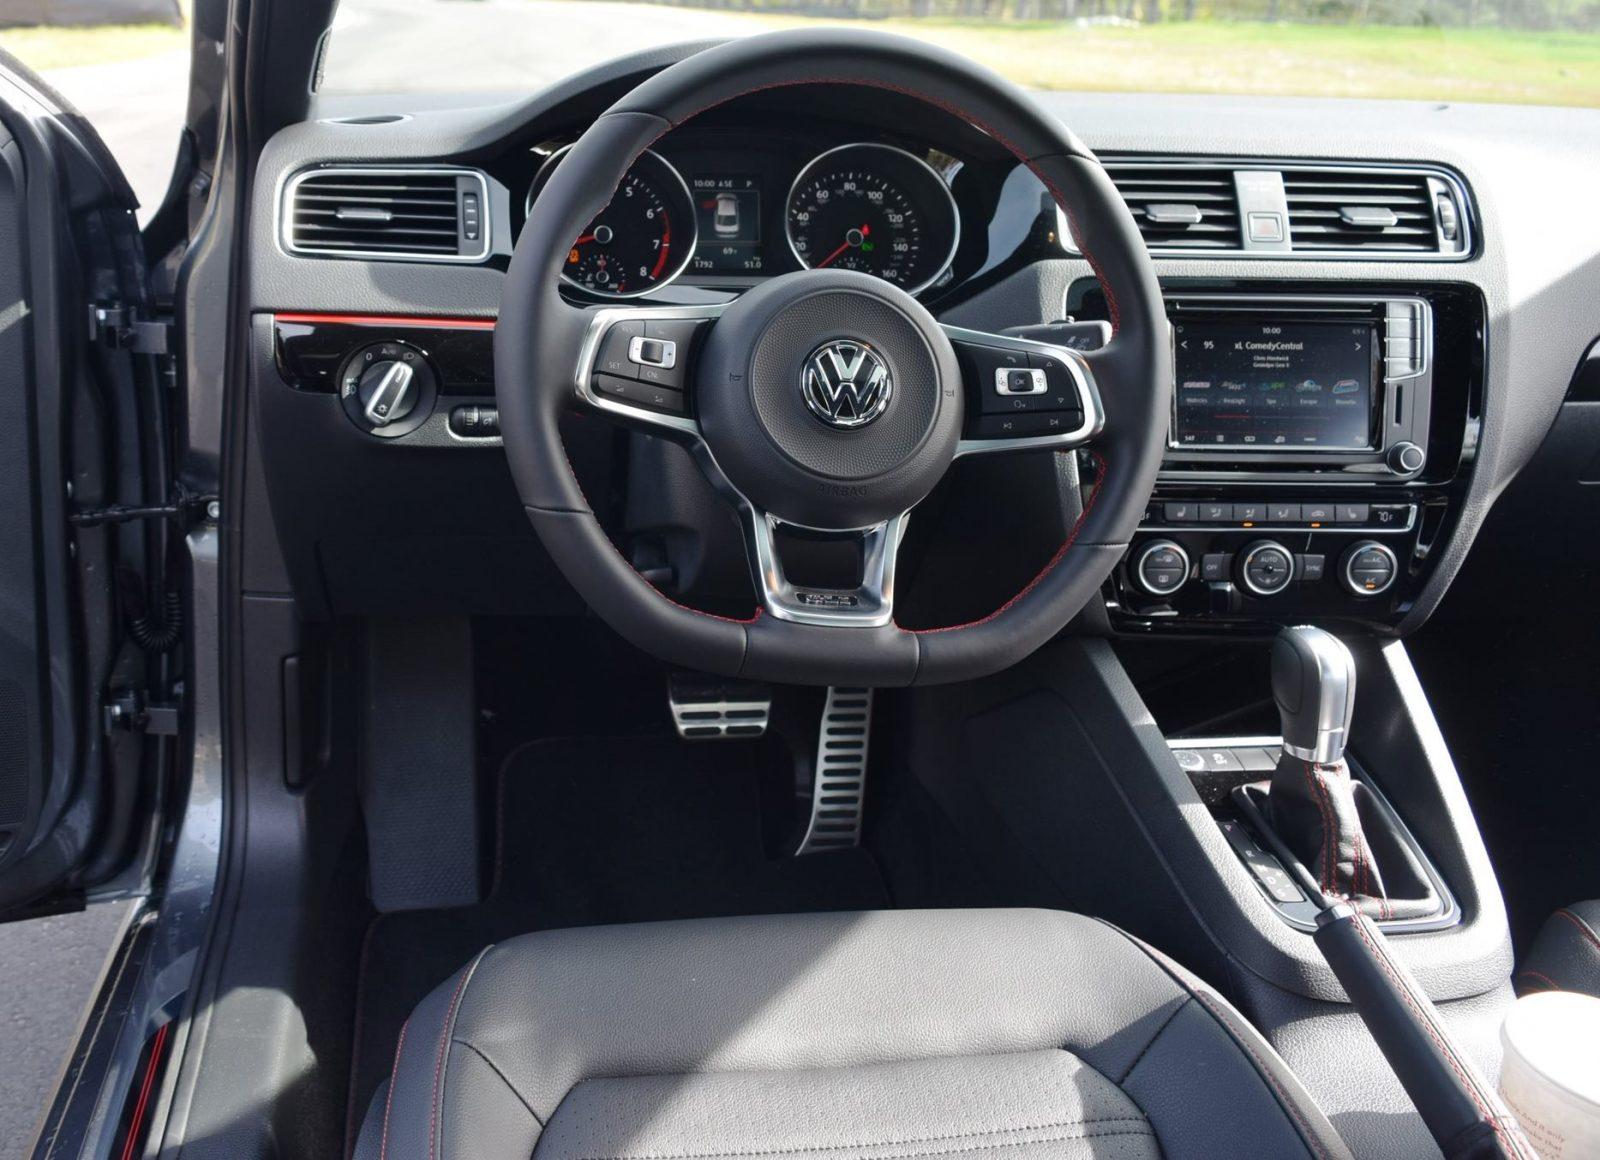 Home » 2017 VW Jetta GLI DSG Automatic U2013 HD Road Test Review » 2017 VW Jetta  GLI Interior 3